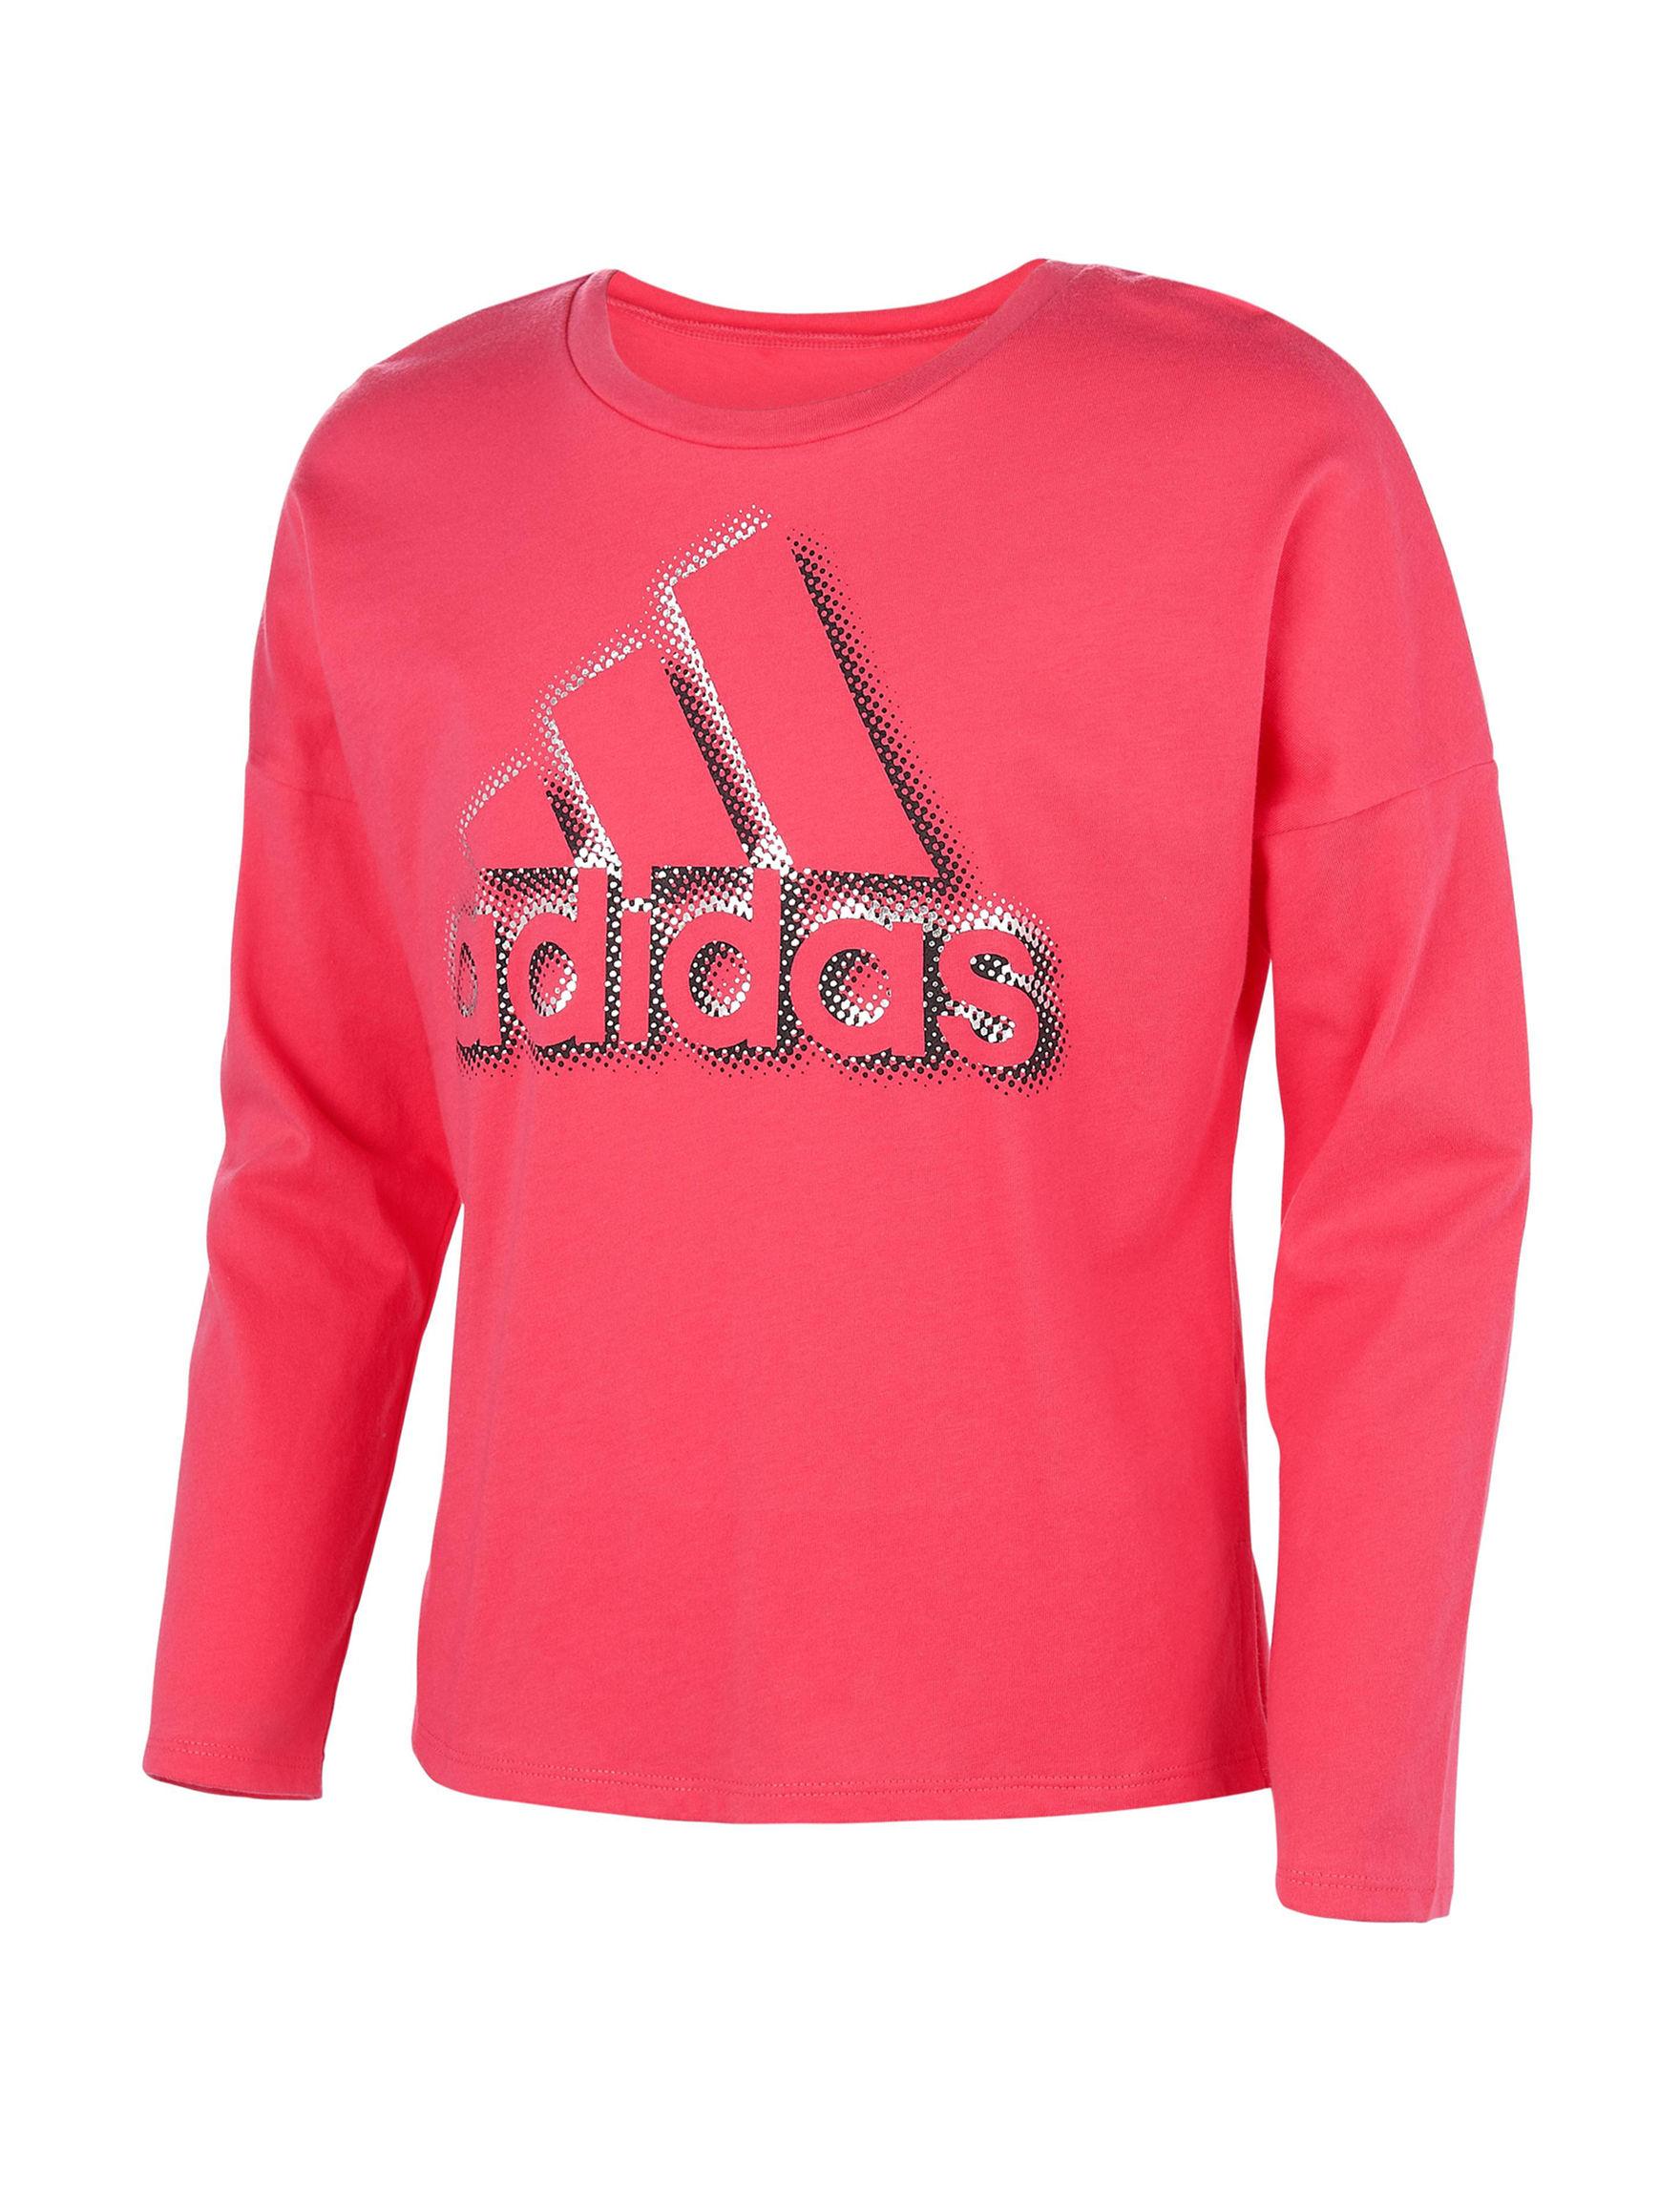 Adidas Pink Tees & Tanks